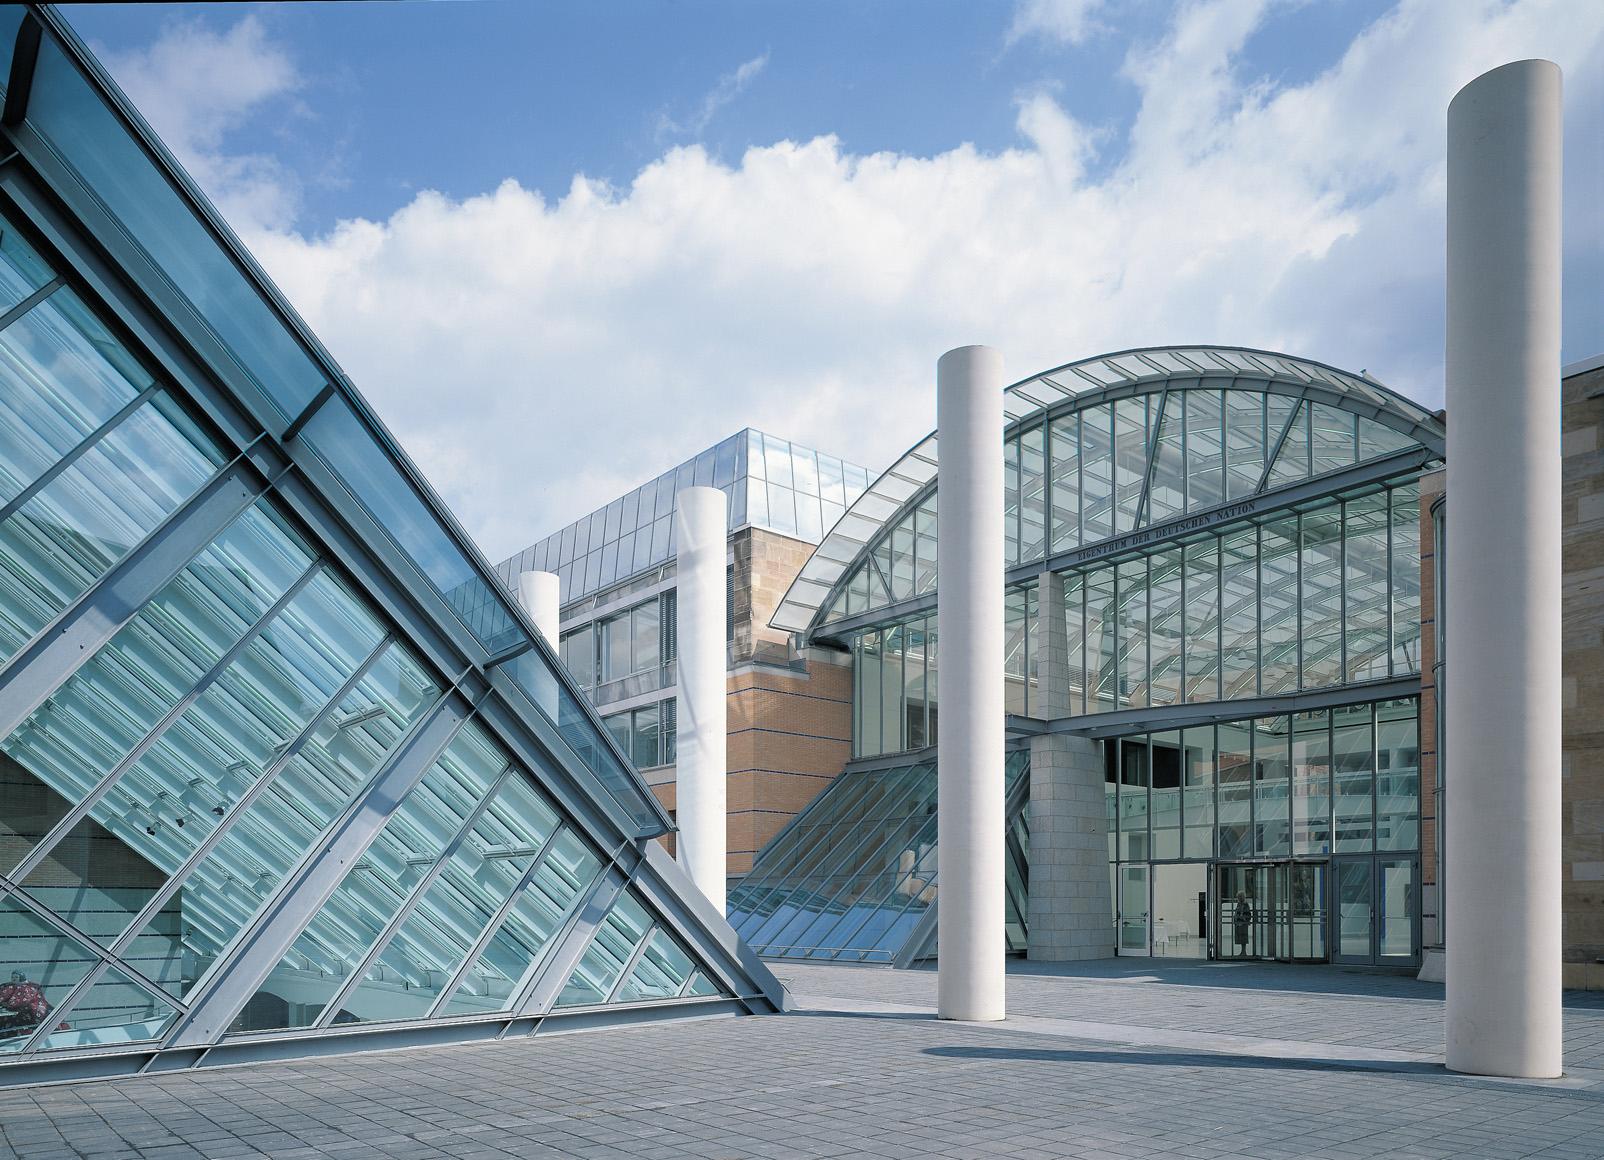 Museen | Museen in Nürnberg | Frankenmetropole Nürnberg: Museum, Austellungen, Museumsausstellung